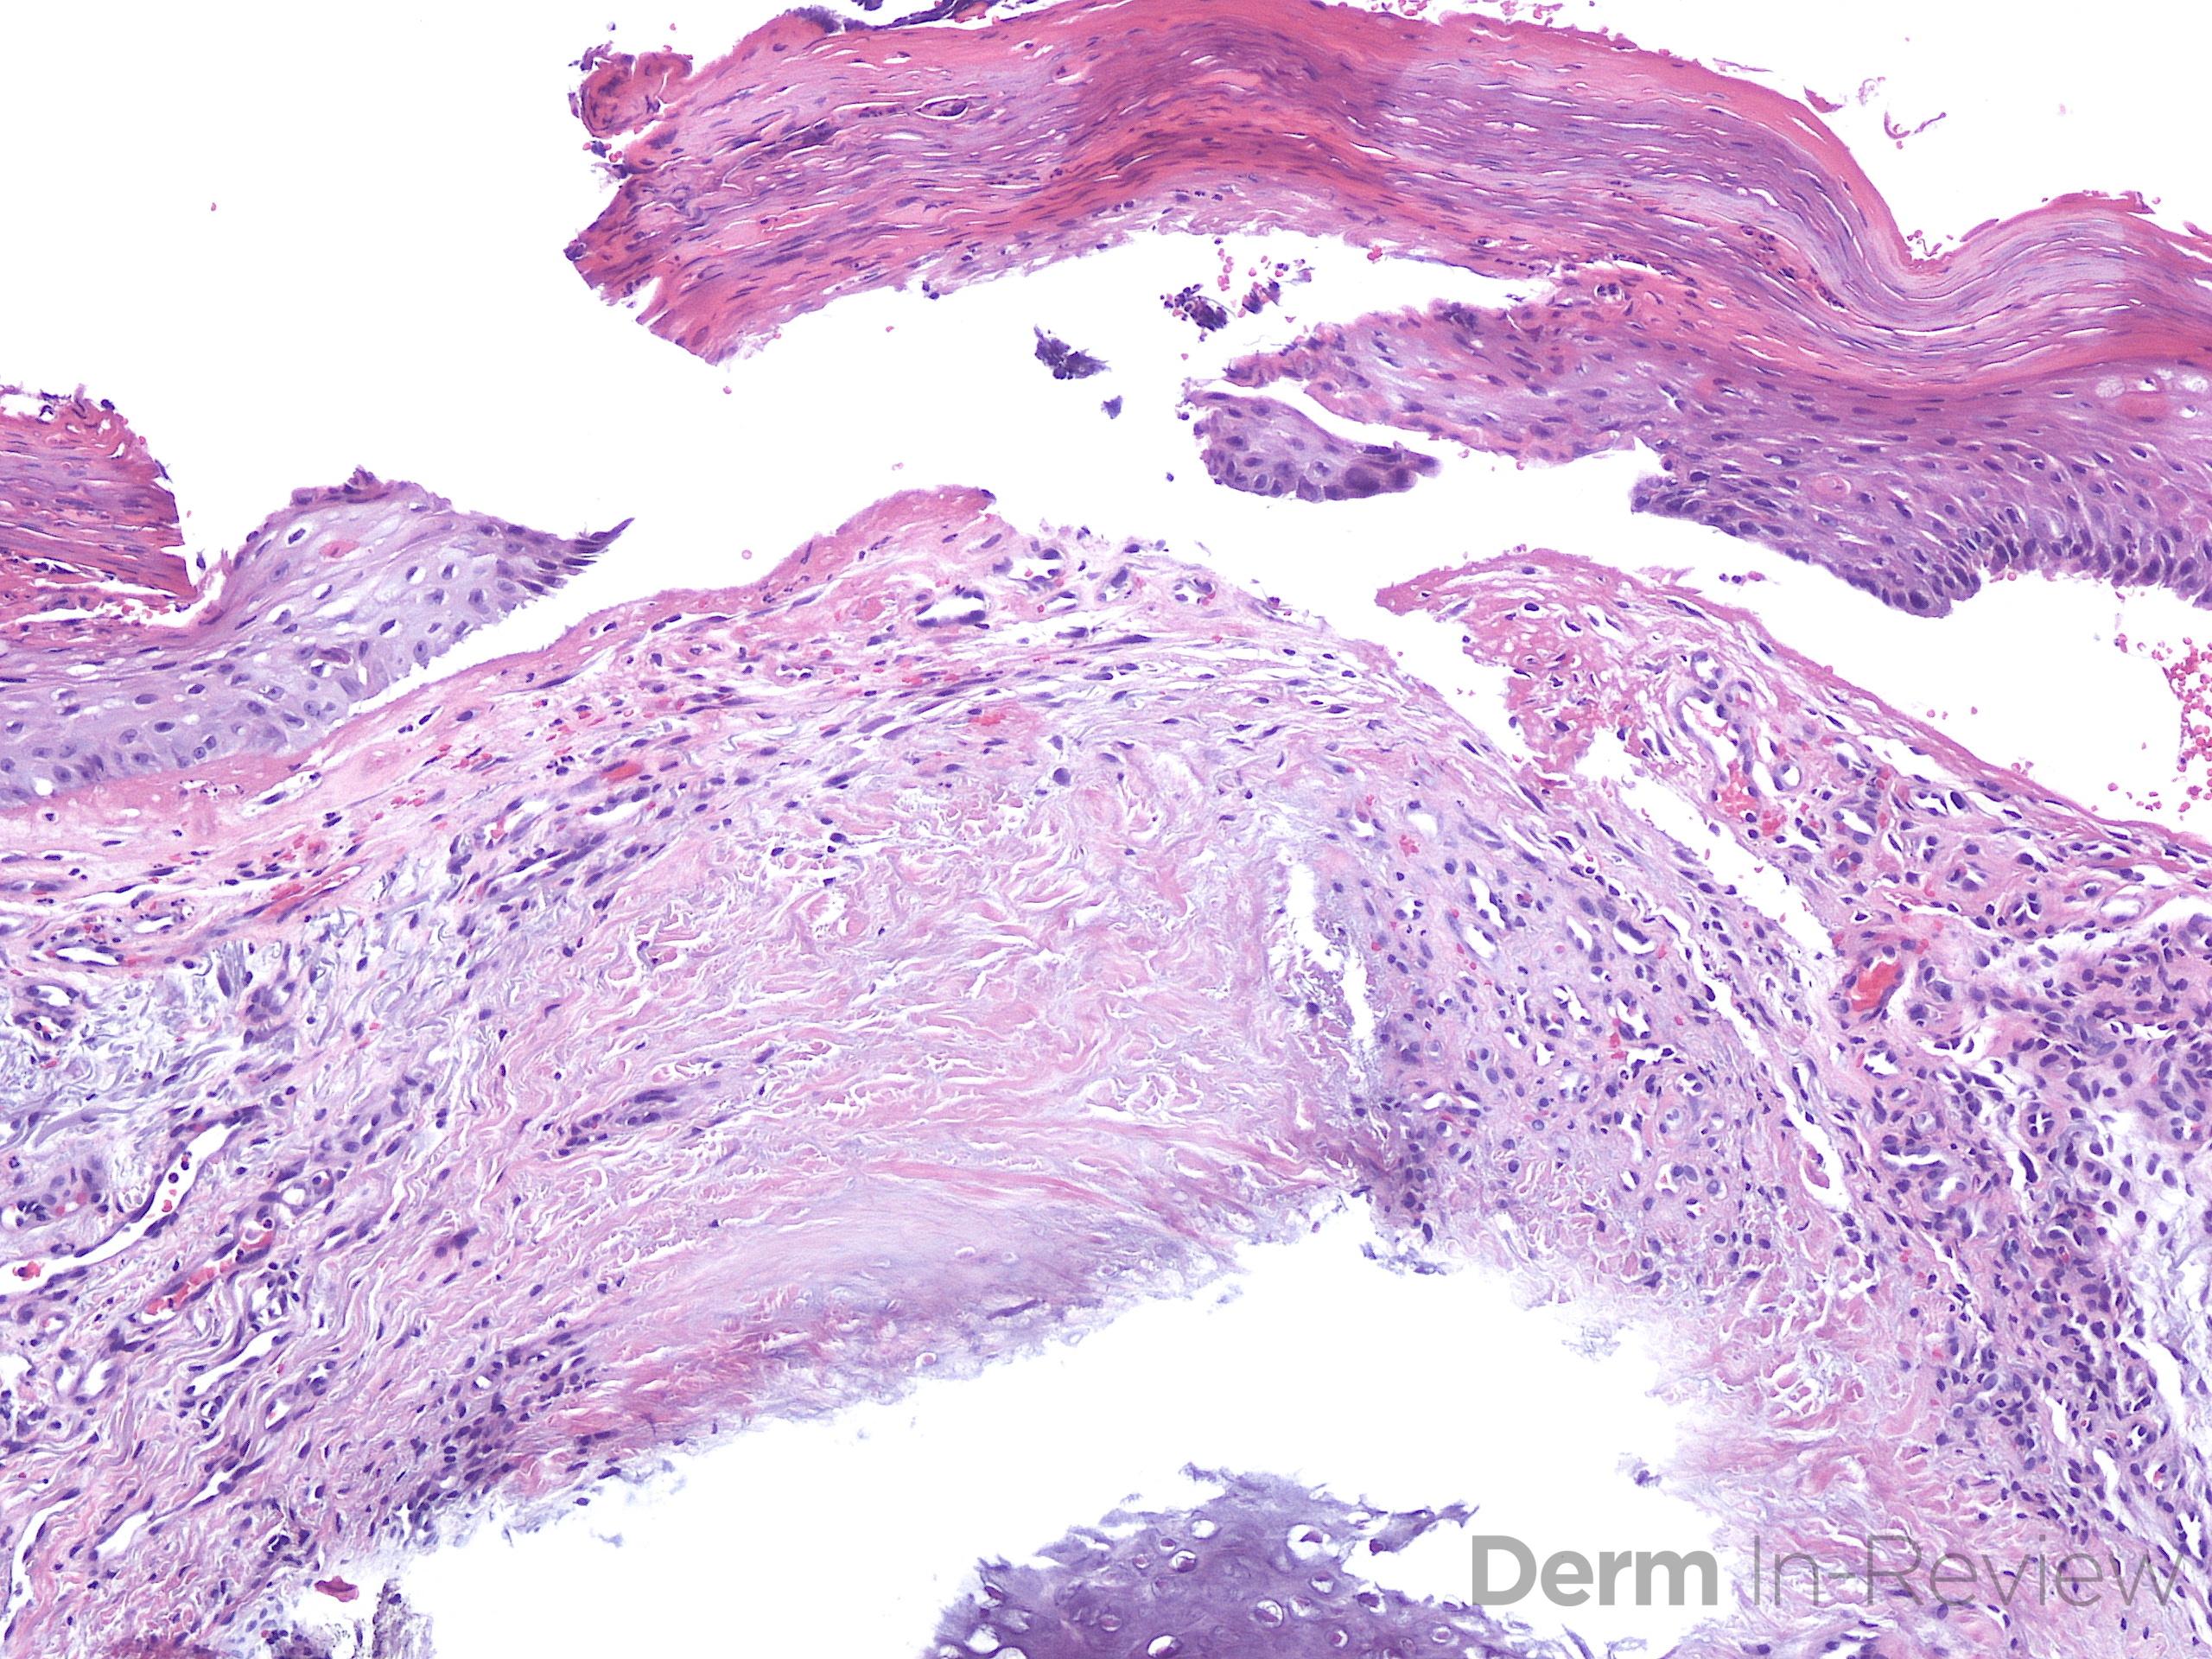 9.7 chondrodermatitis nodularis helicis